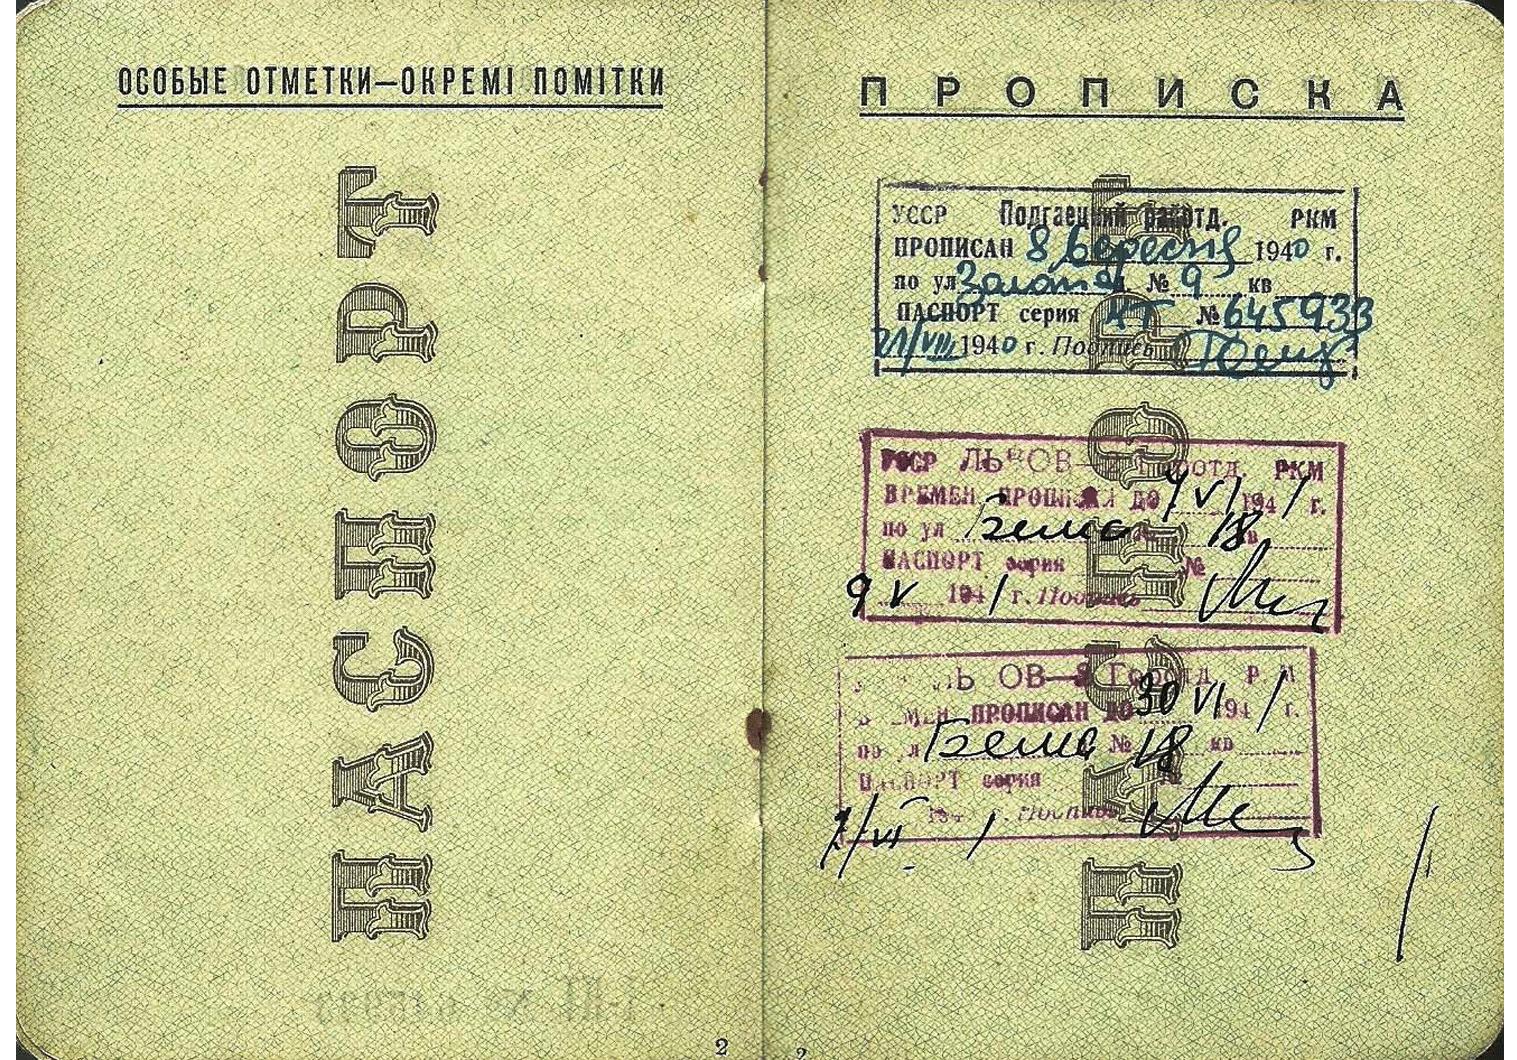 WW2 Soviet occupation passport